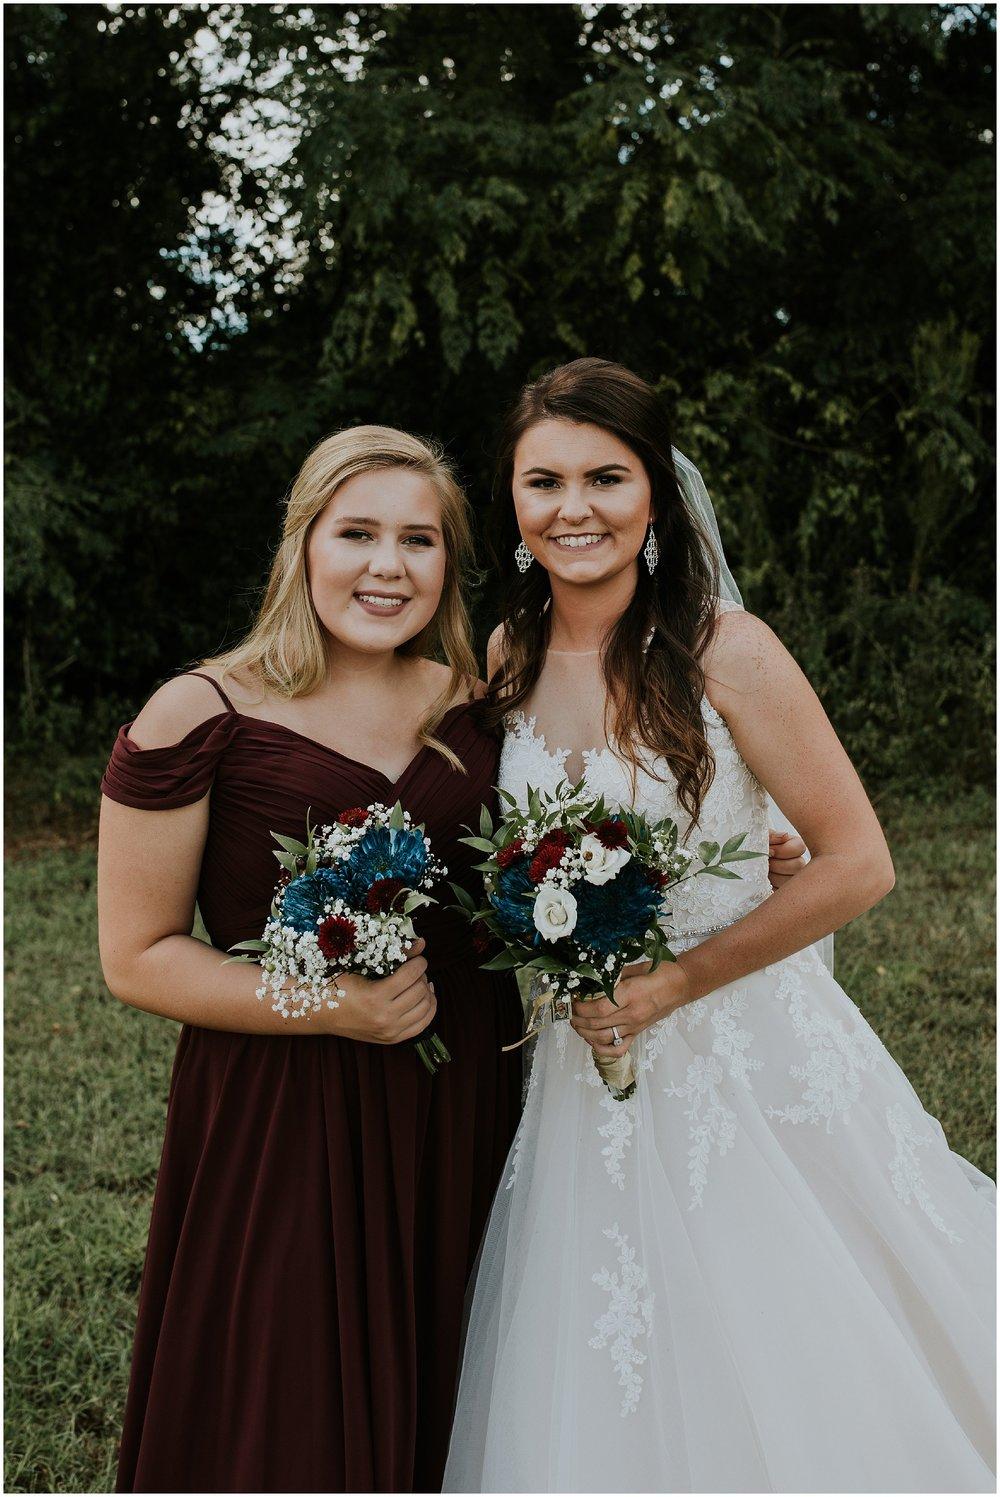 201809180039: Kimberly Perry Wedding Dress At Reisefeber.org